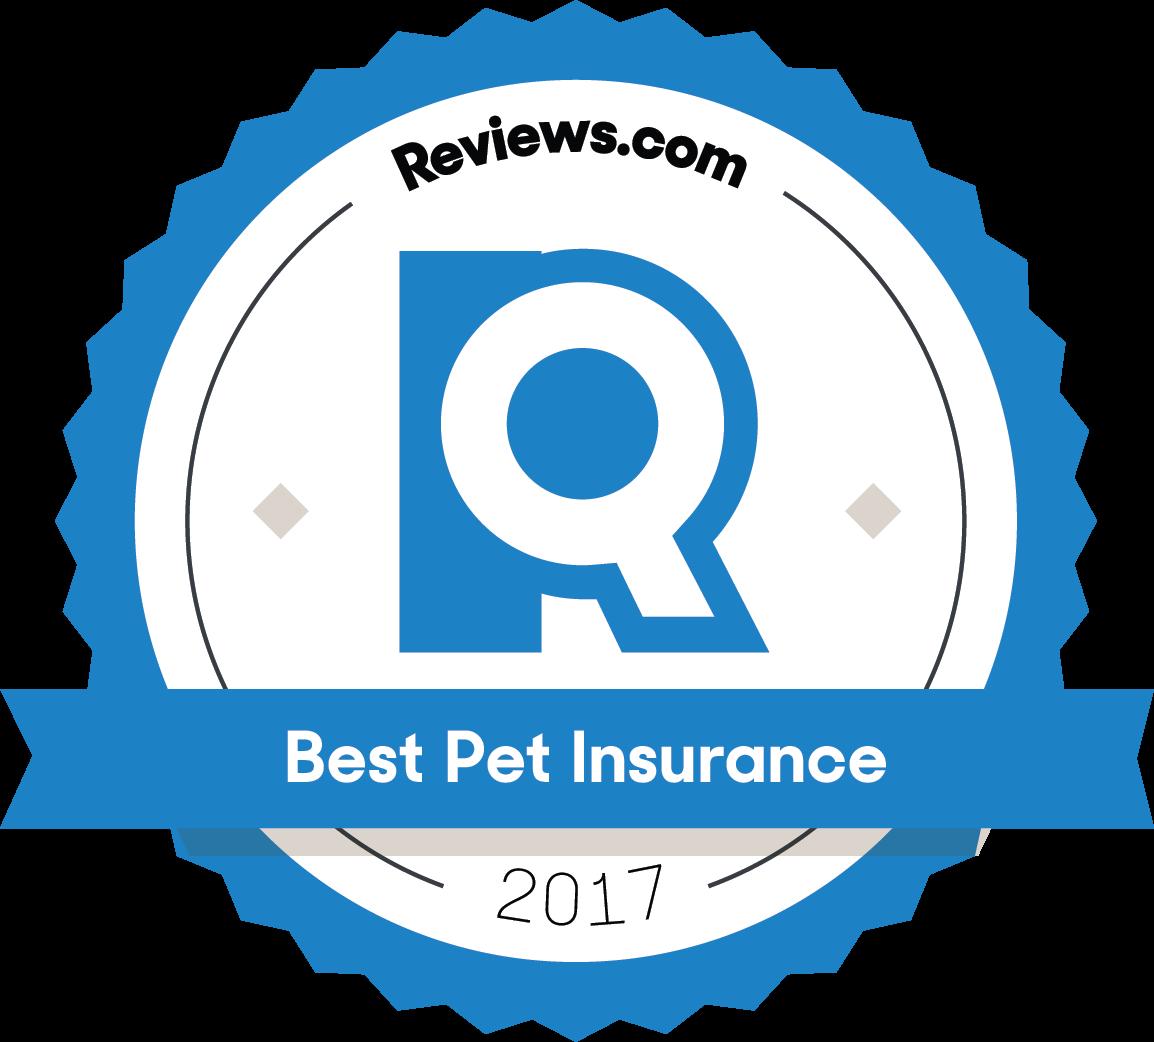 The Best Pet Insurance for 2018 - Reviews.com